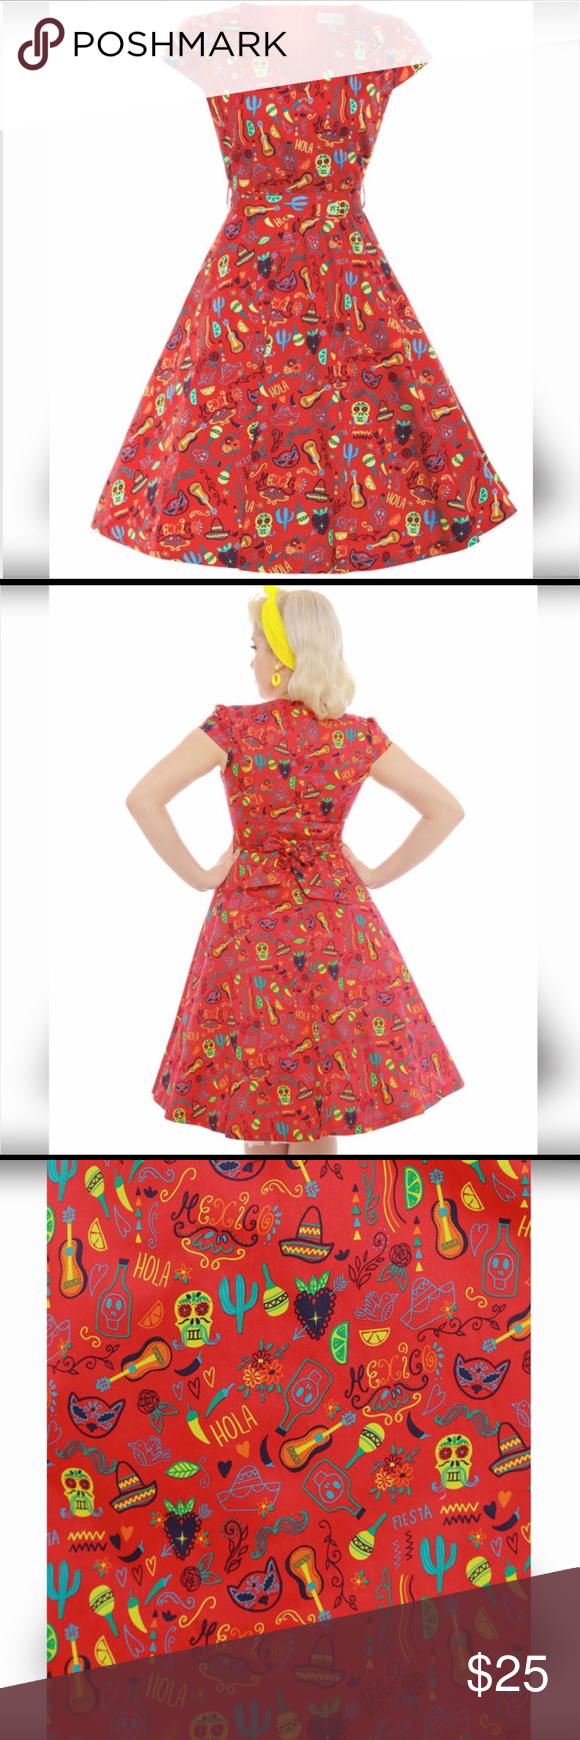 Lindy Bop Swing Dress New Size Us 12 Uk 16